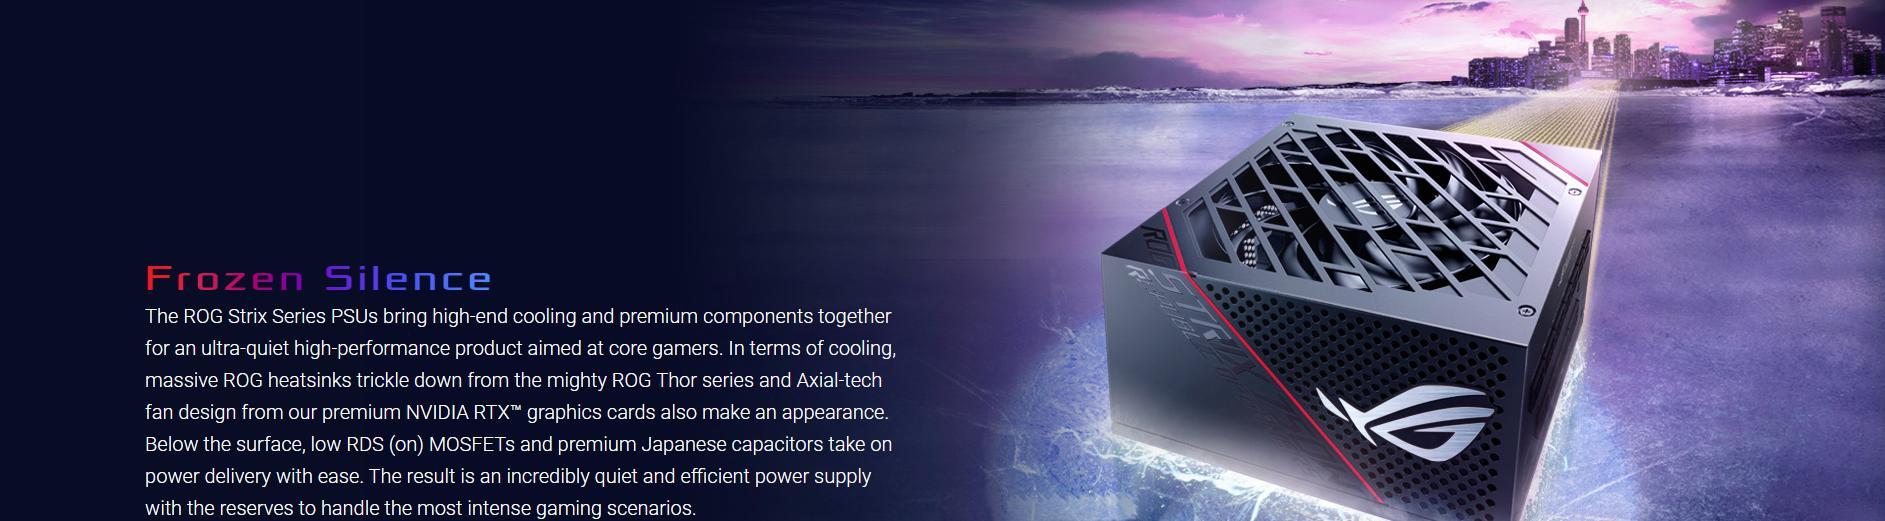 Nguồn Asus ROG Strix 650W Gold - 650W 80 Plus Gold Full Modular giới thiệu